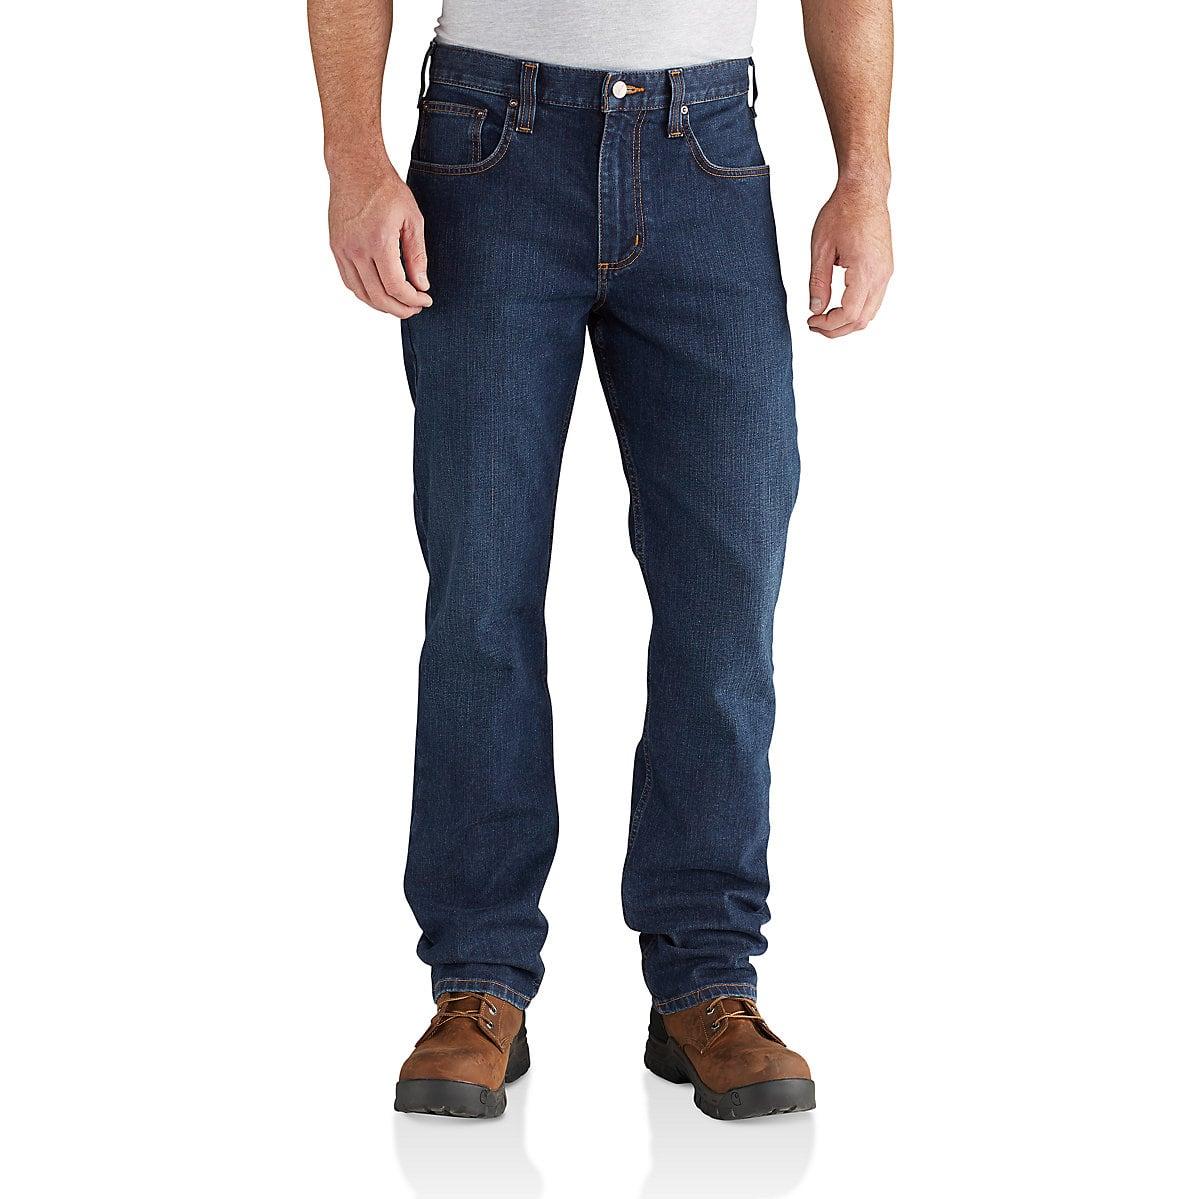 5840a0a9cb6 Men s Rugged Flex® Relaxed Fit Straight Leg Jean